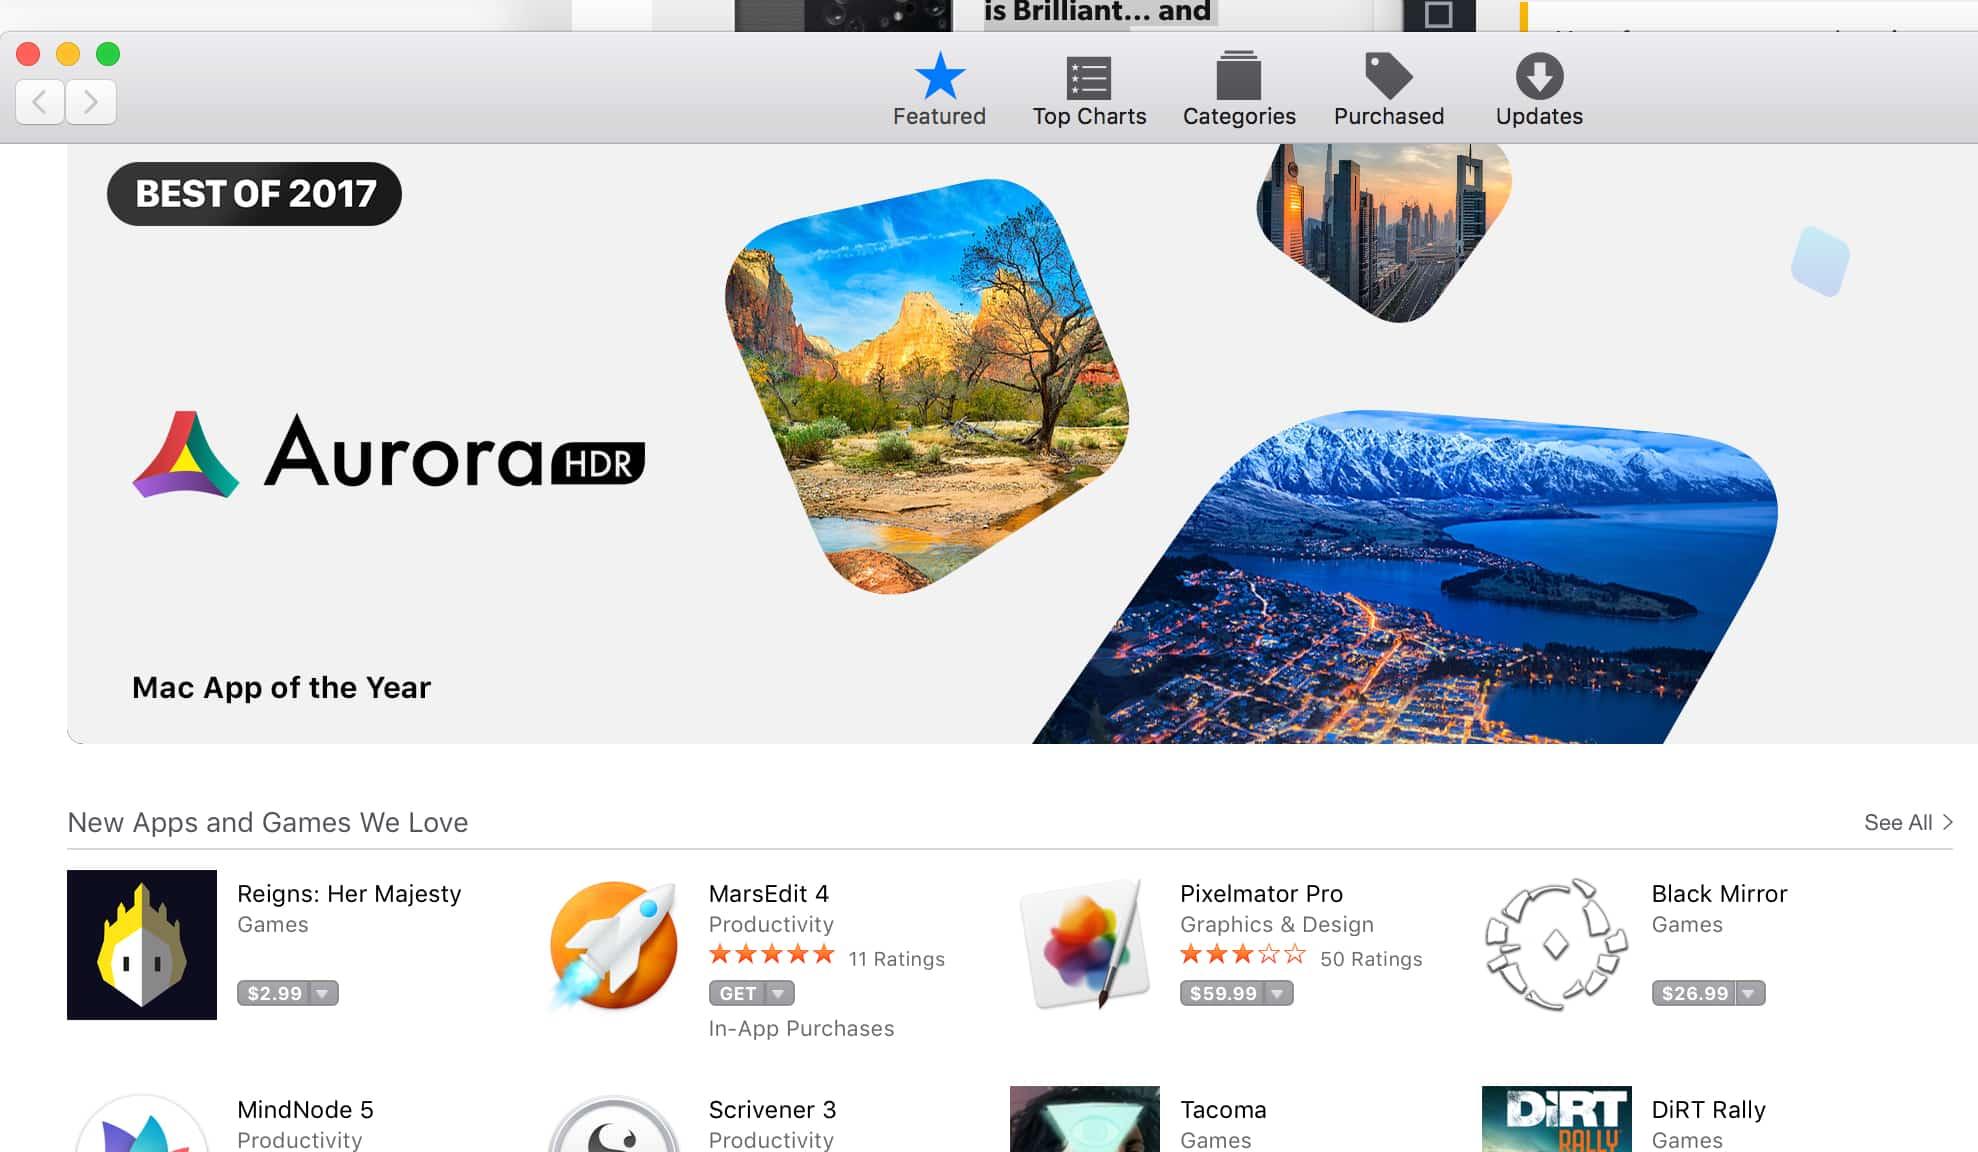 Aurora HDR 2018 - Mac App Of The Year 2017